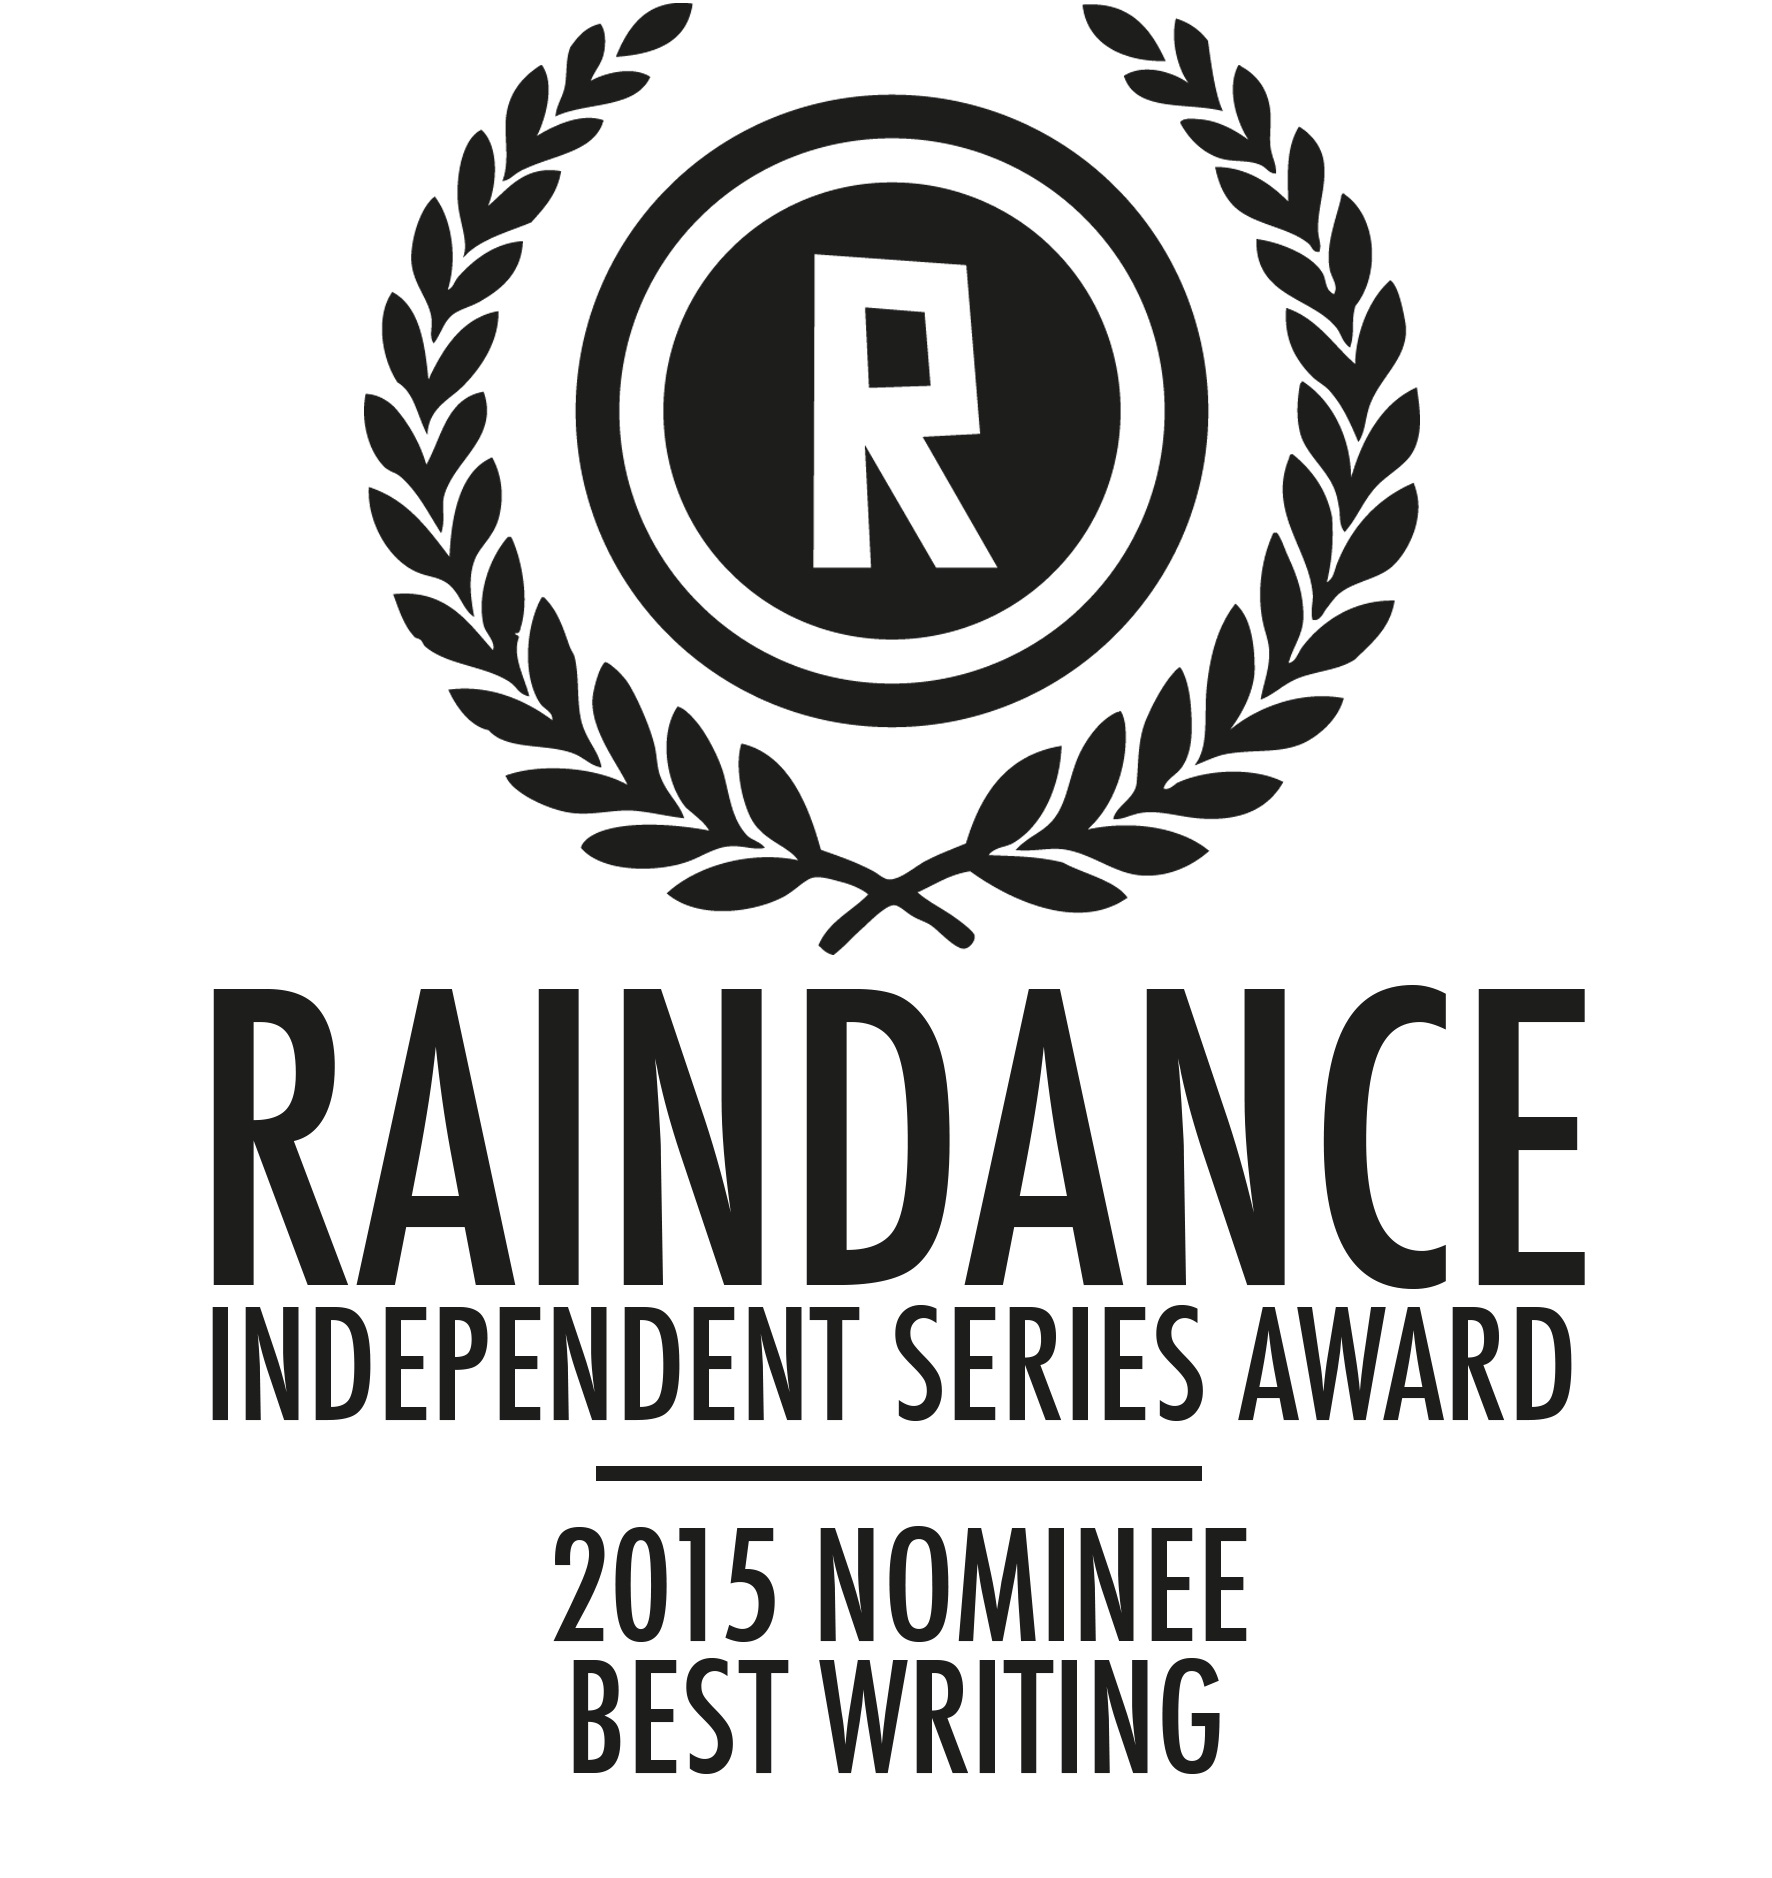 Raindance Webfest 2015 Nominee